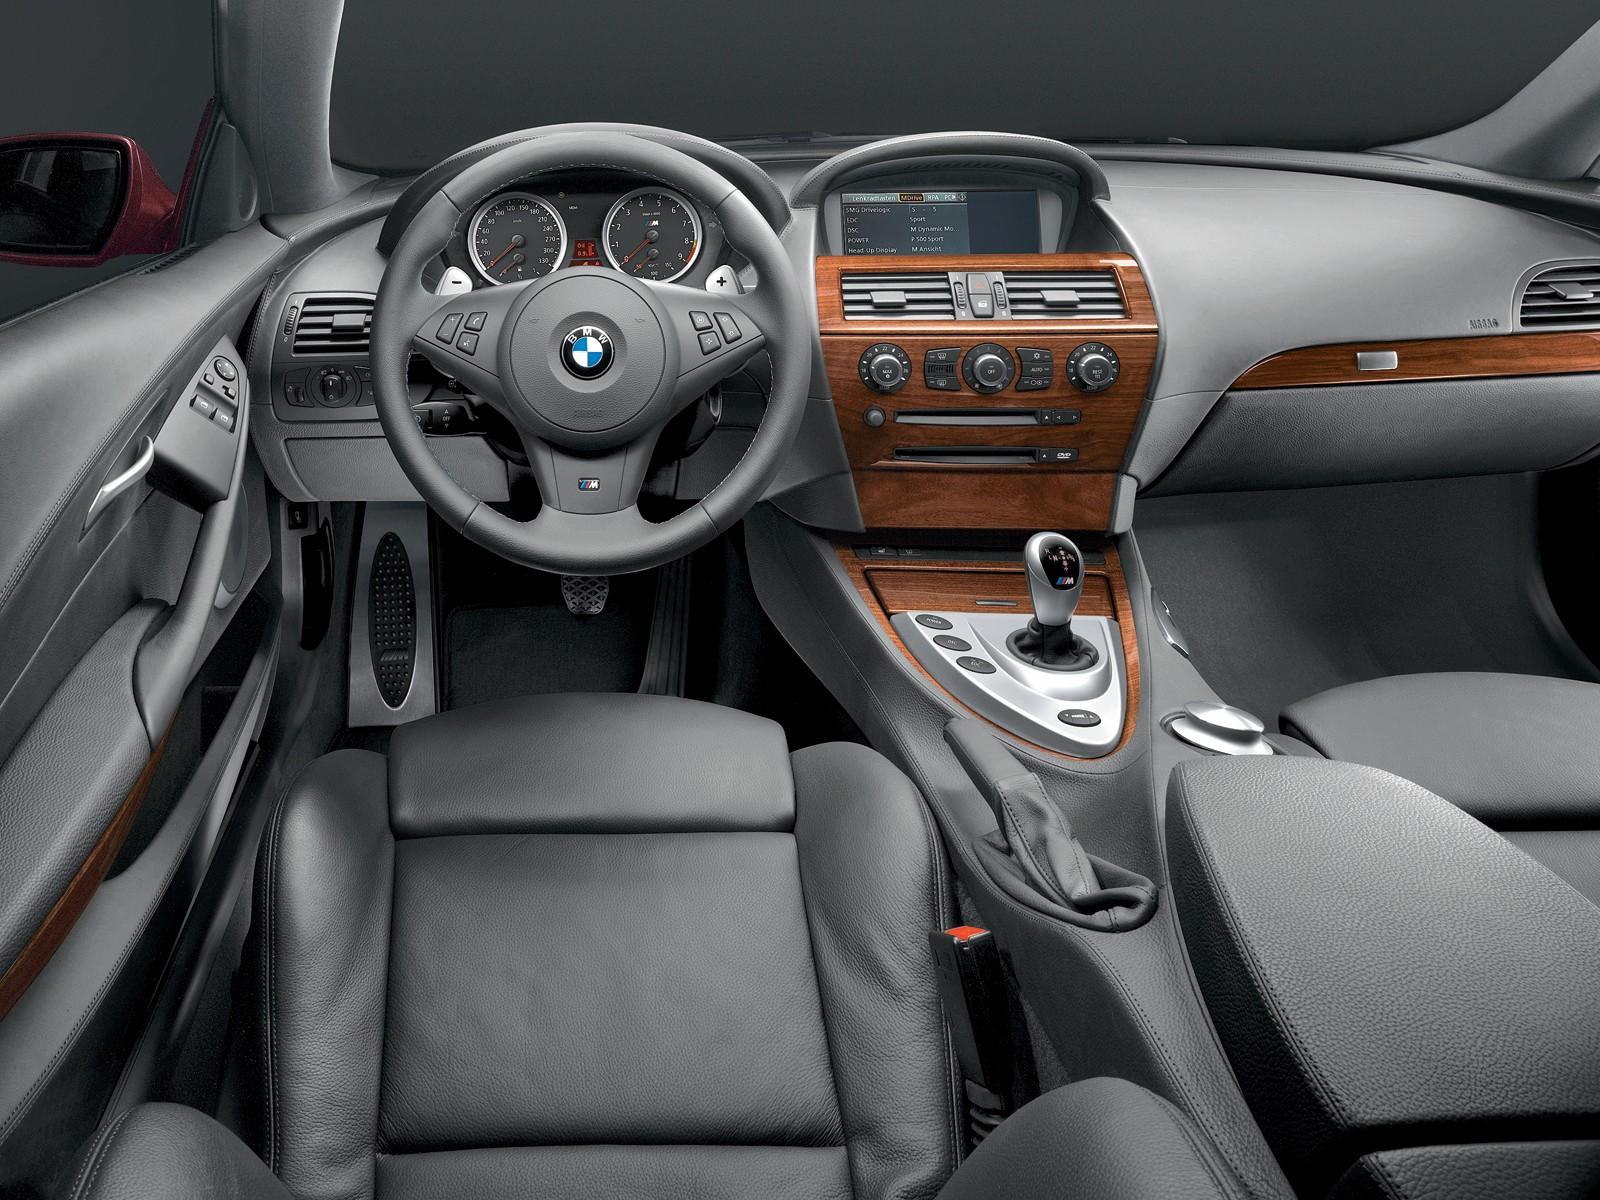 BMW M6 interiors